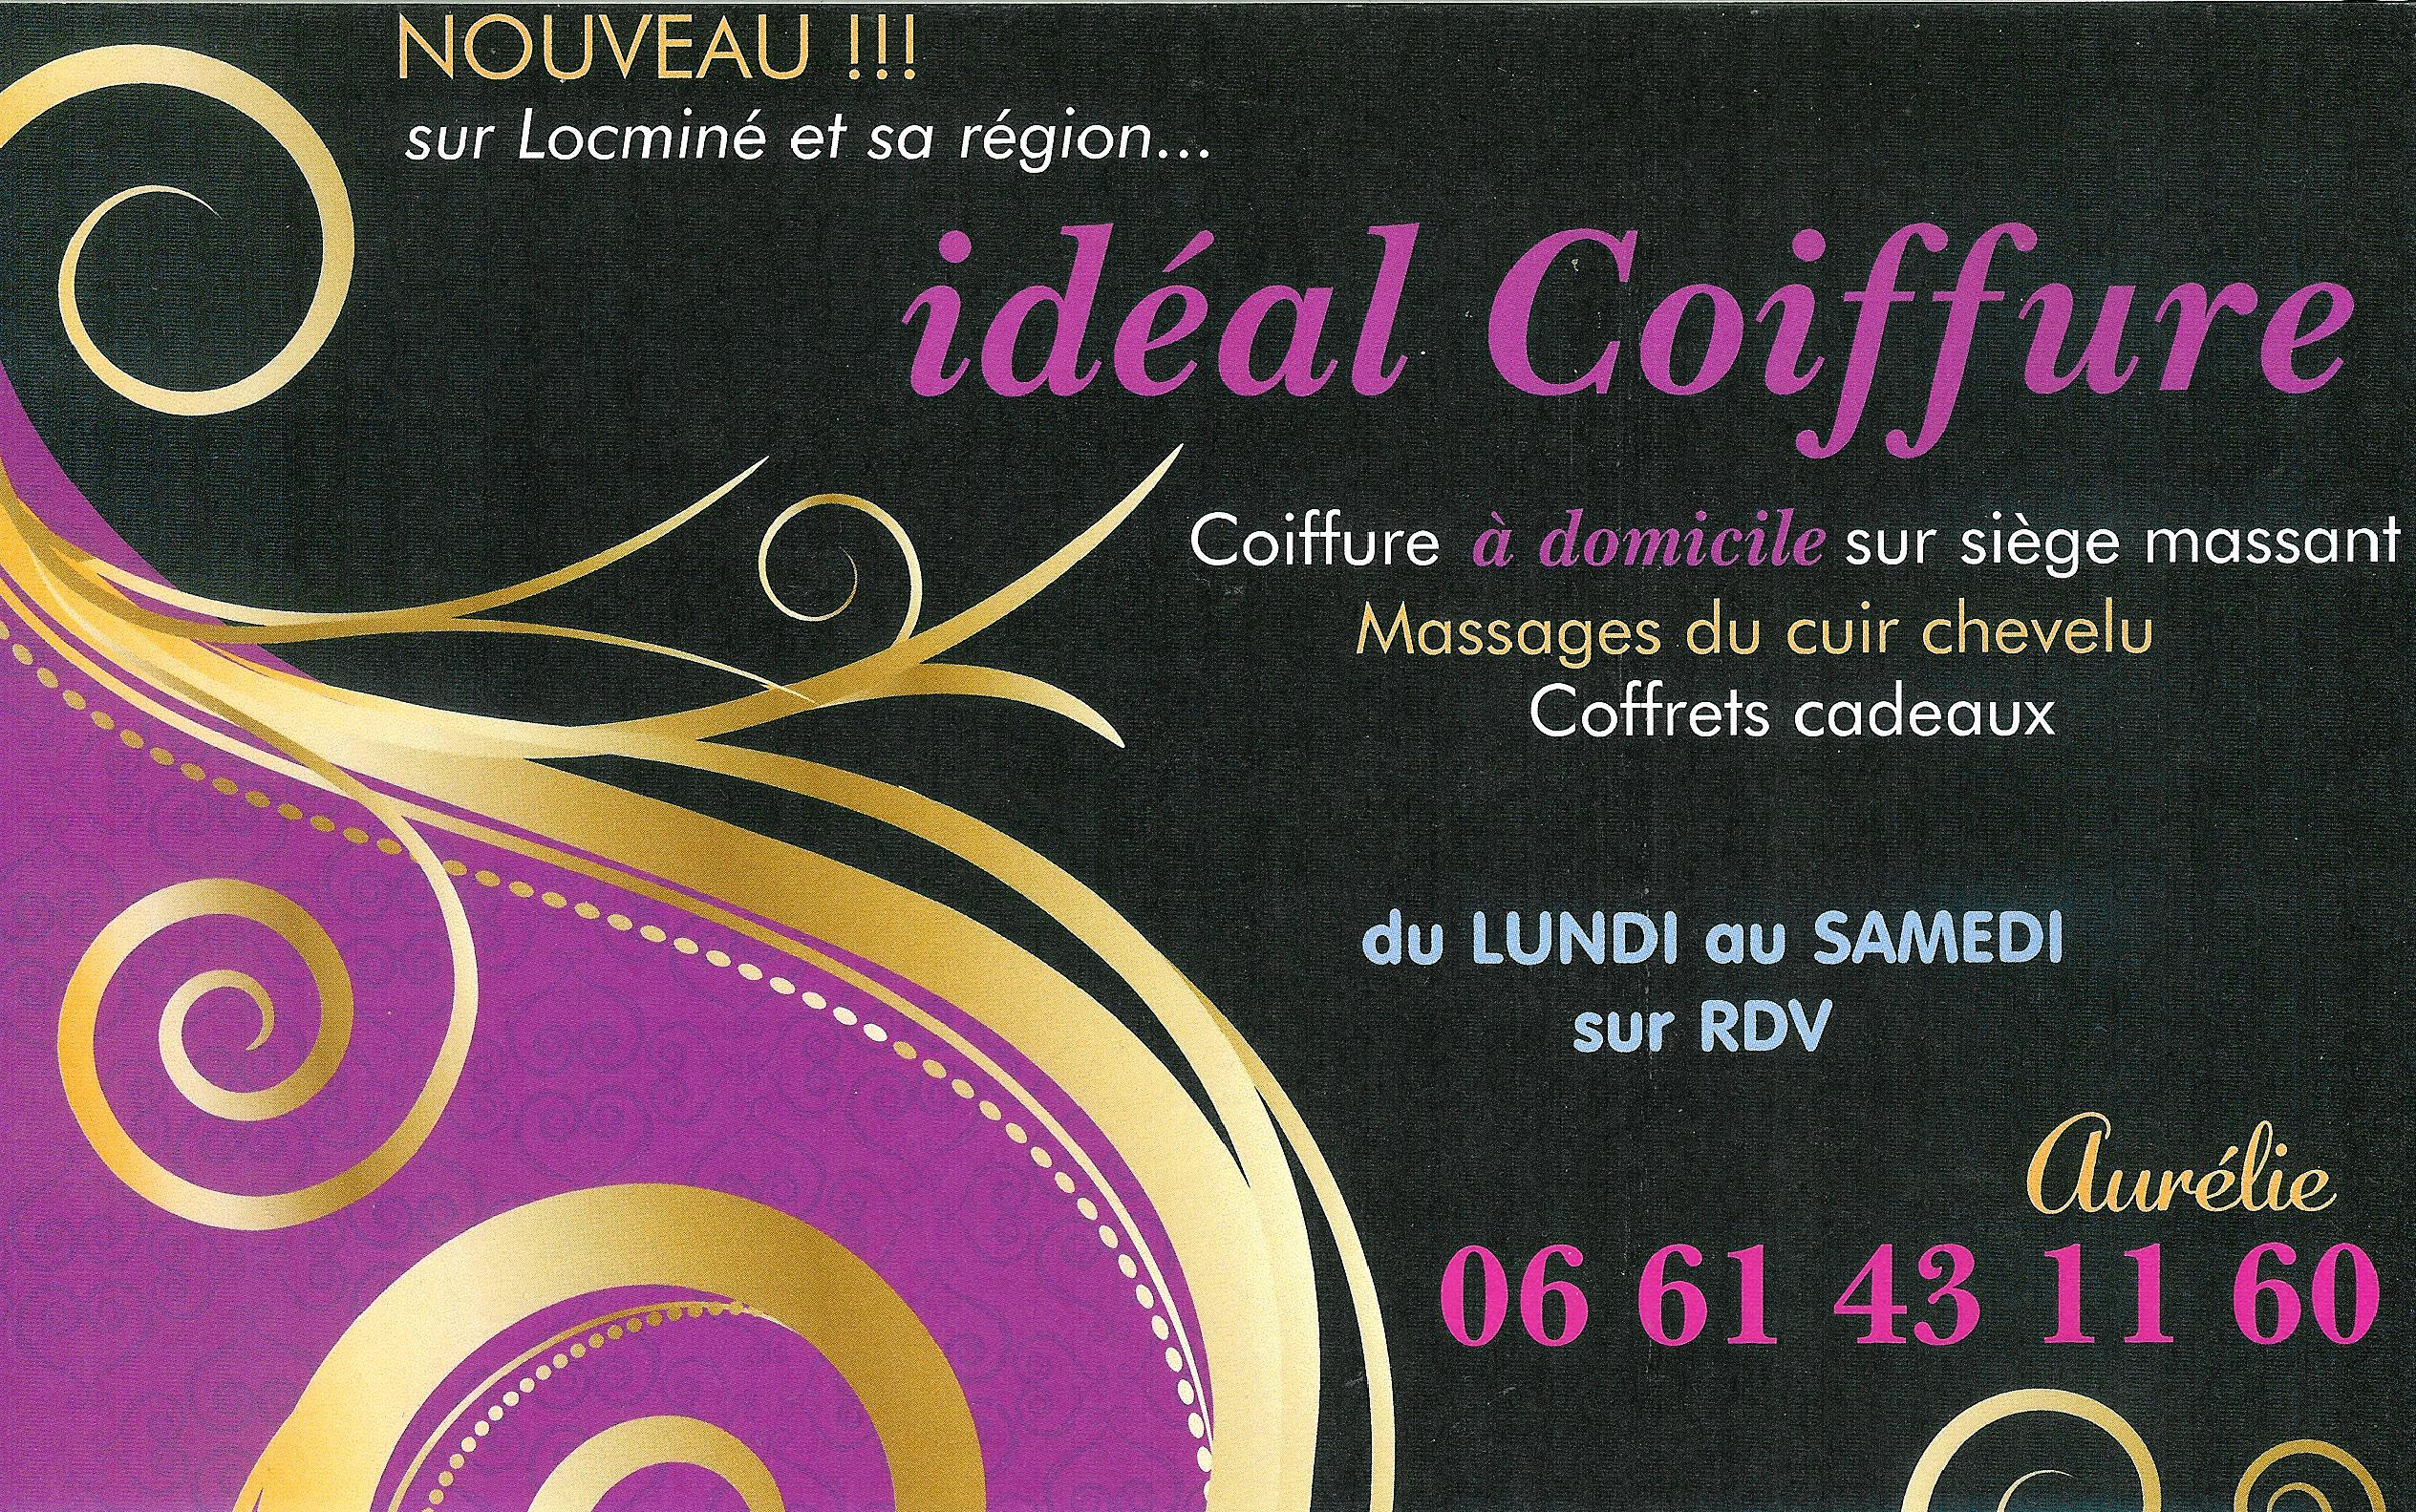 Exceptionnel bandeau-ideal-coiffure-flyer.jpg - Ideal Coiffure à Domicile UF87